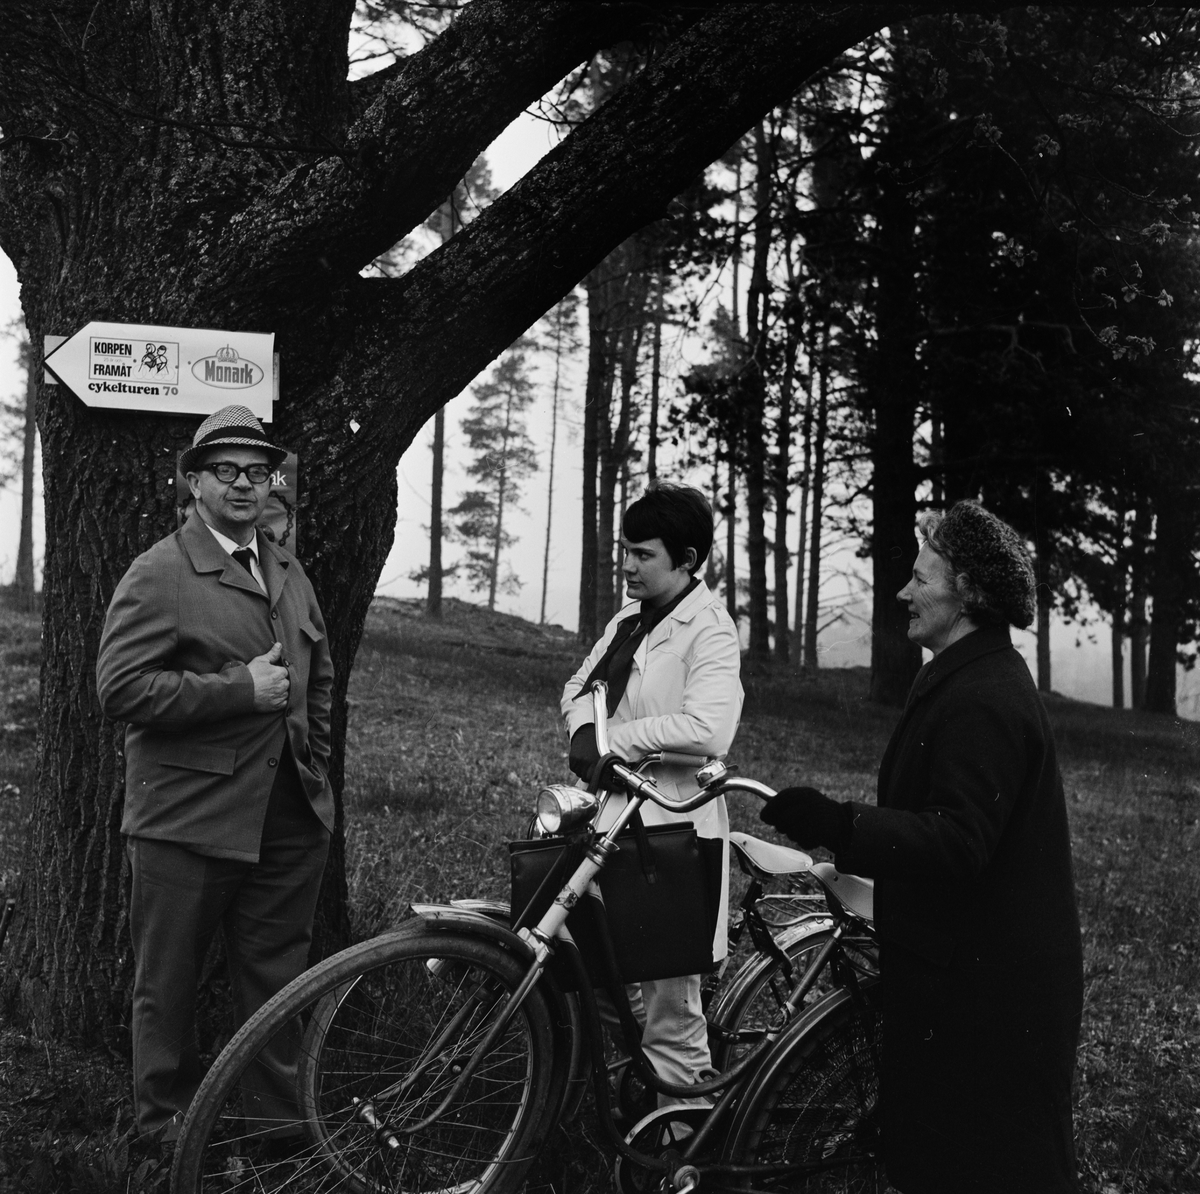 Kylslagen cykelupptakt i Tierp, Uppland maj 1970